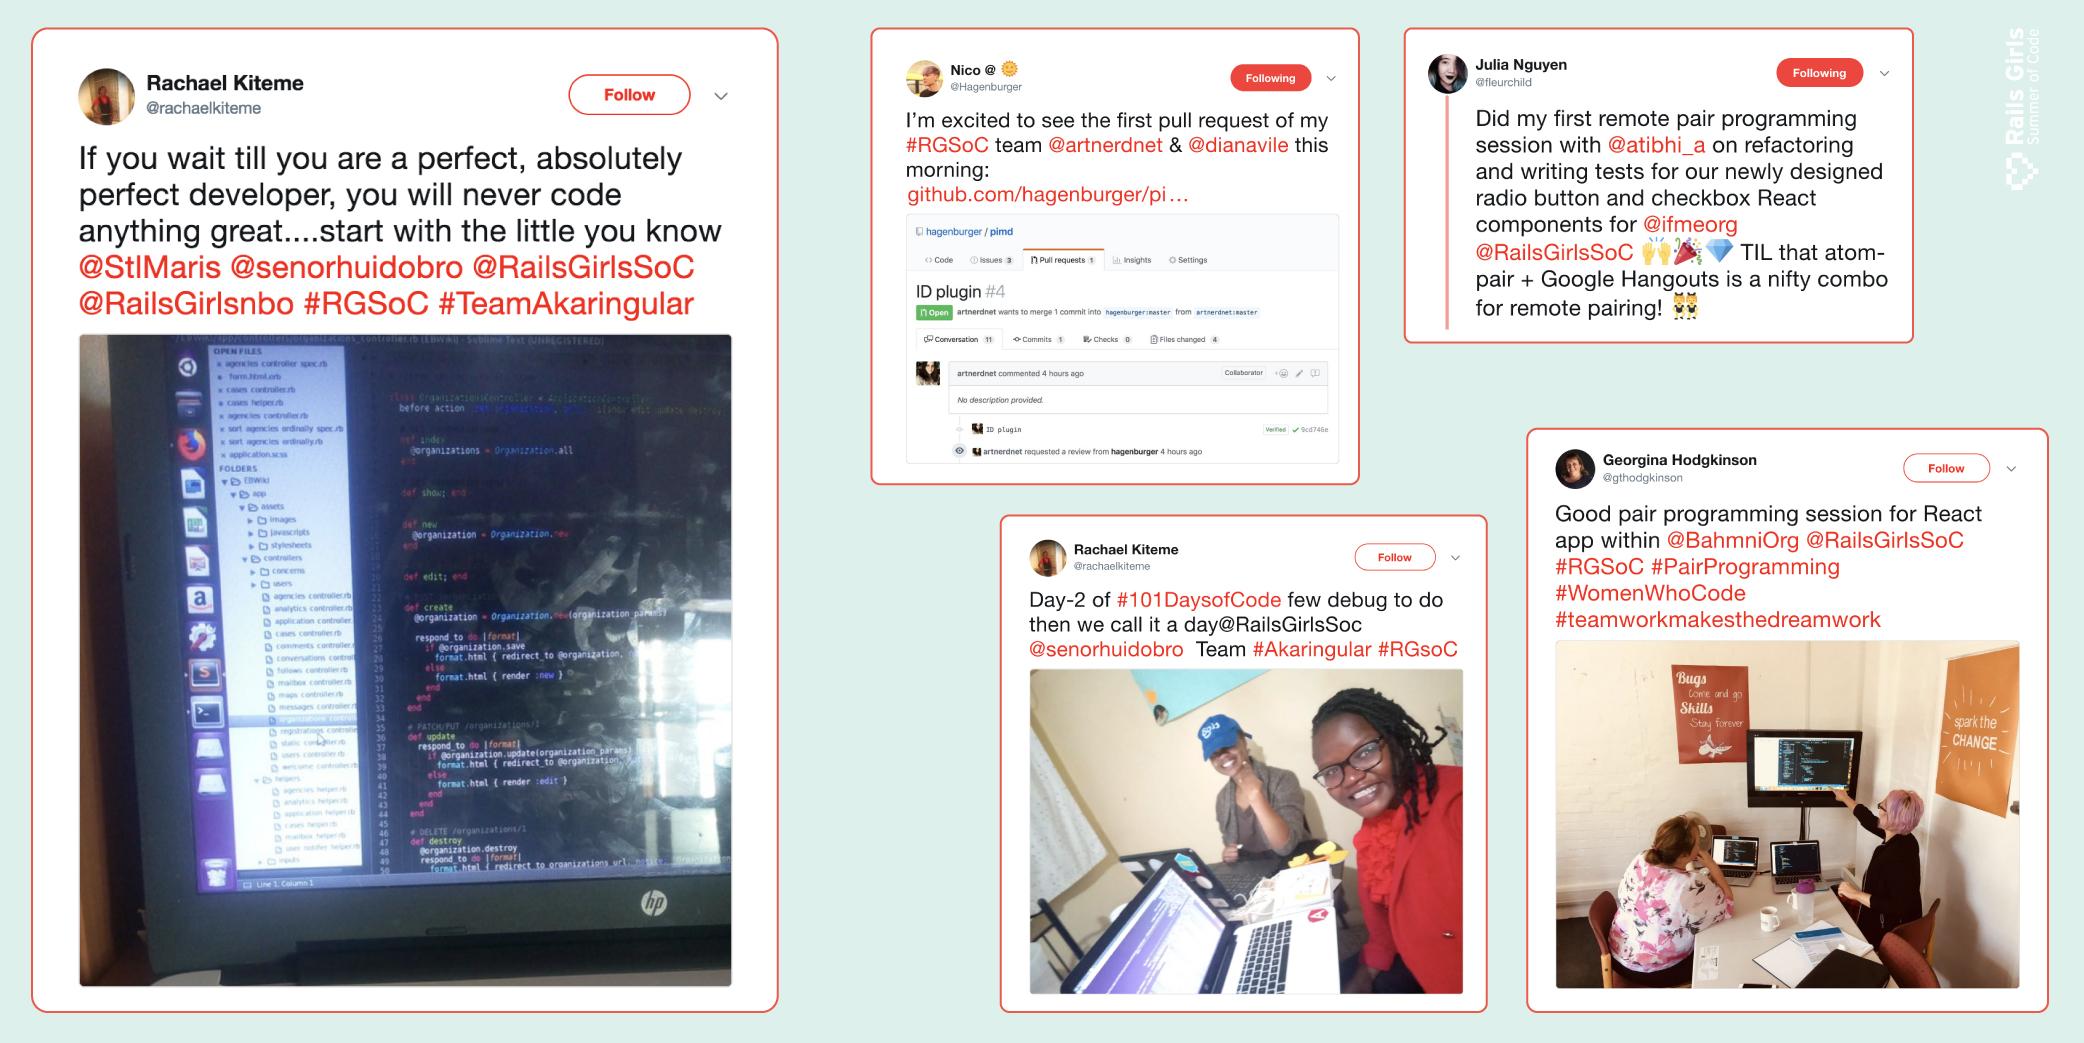 Rails Girls Summer of Code Blog | Rails Girls Summer of Code